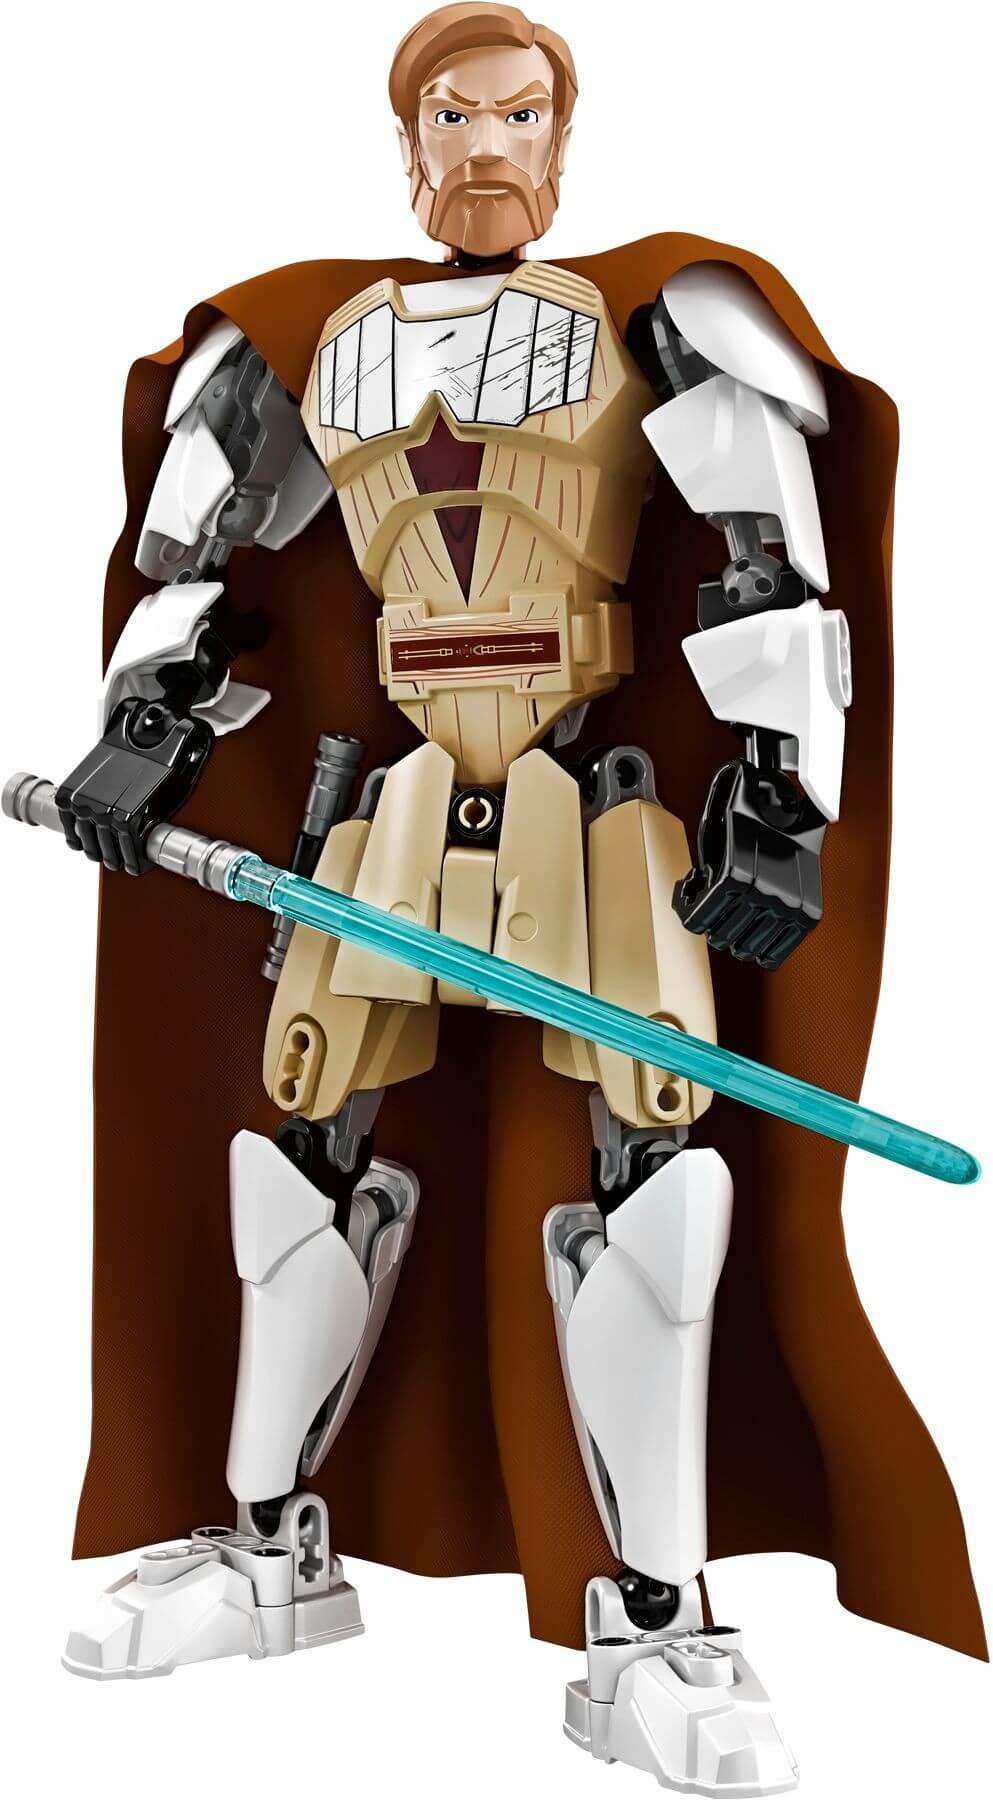 Mua đồ chơi LEGO 75109 - LEGO Star Wars 75109 - Mô hình Sư phụ Jedi Obi-Wan Kenobi (LEGO Star Wars Obi-Wan Kenobi 75109)